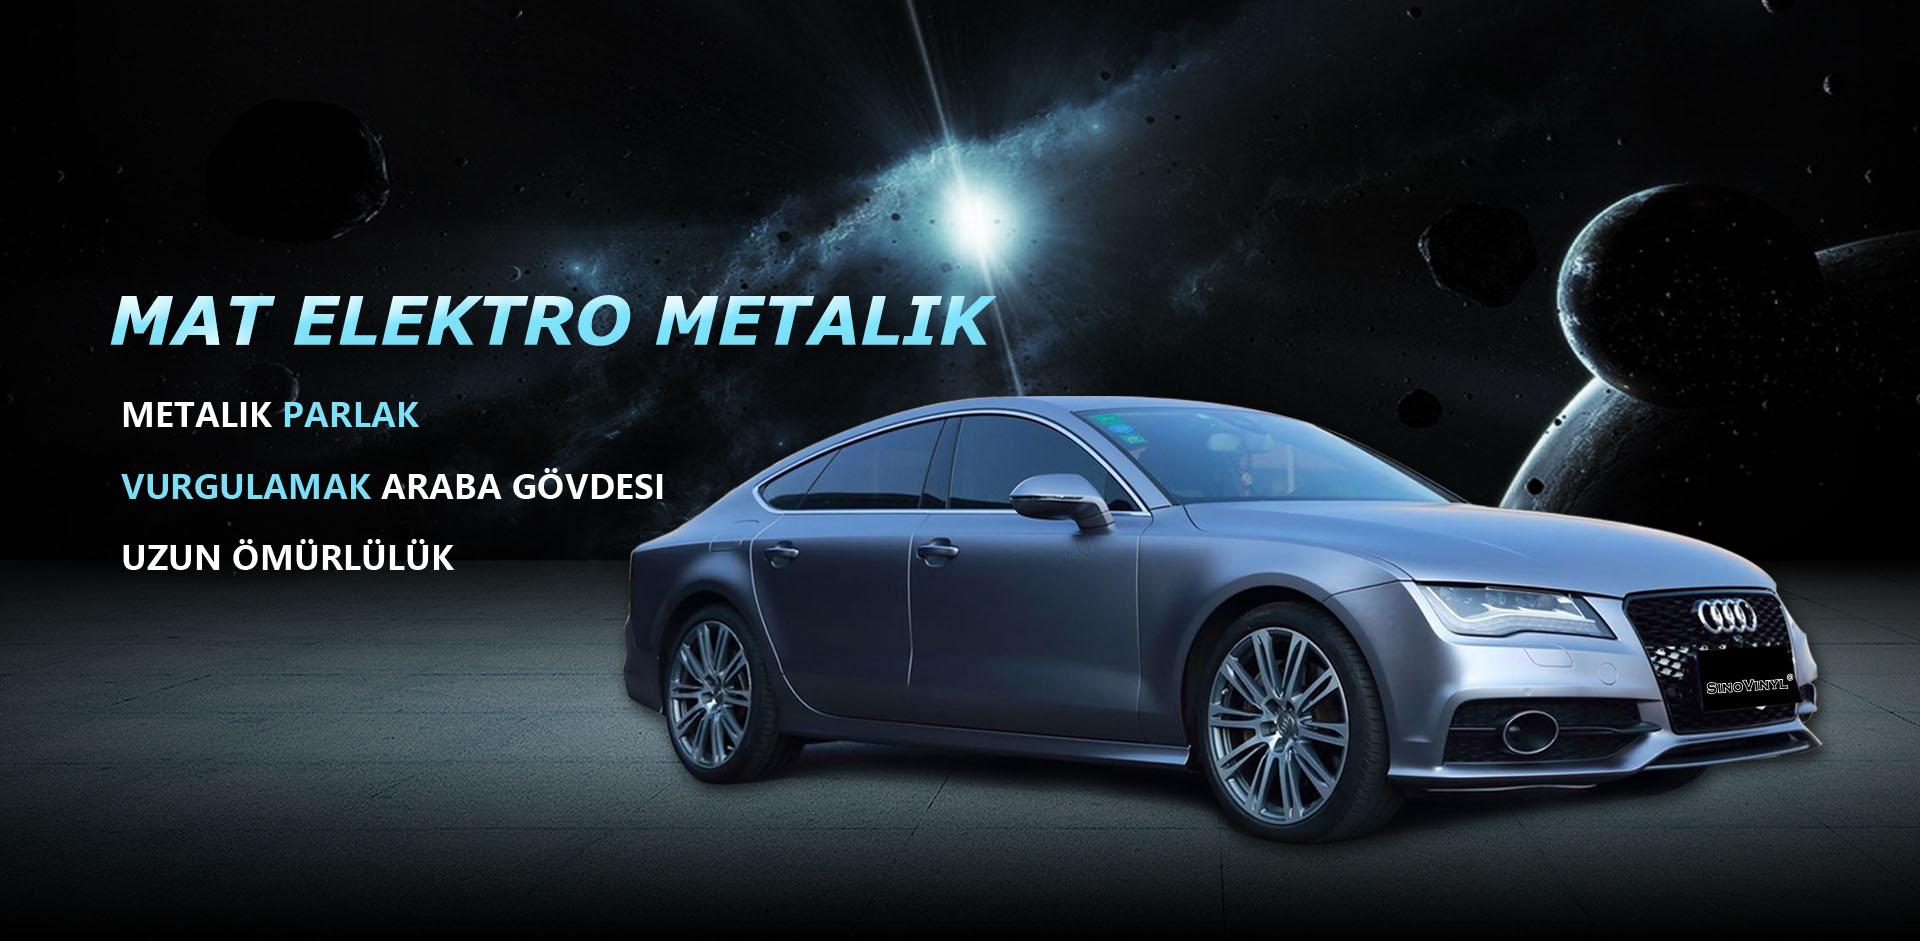 CARLIKE CL-EM Mat Elektro Metalik Vinil Araç Kaplama